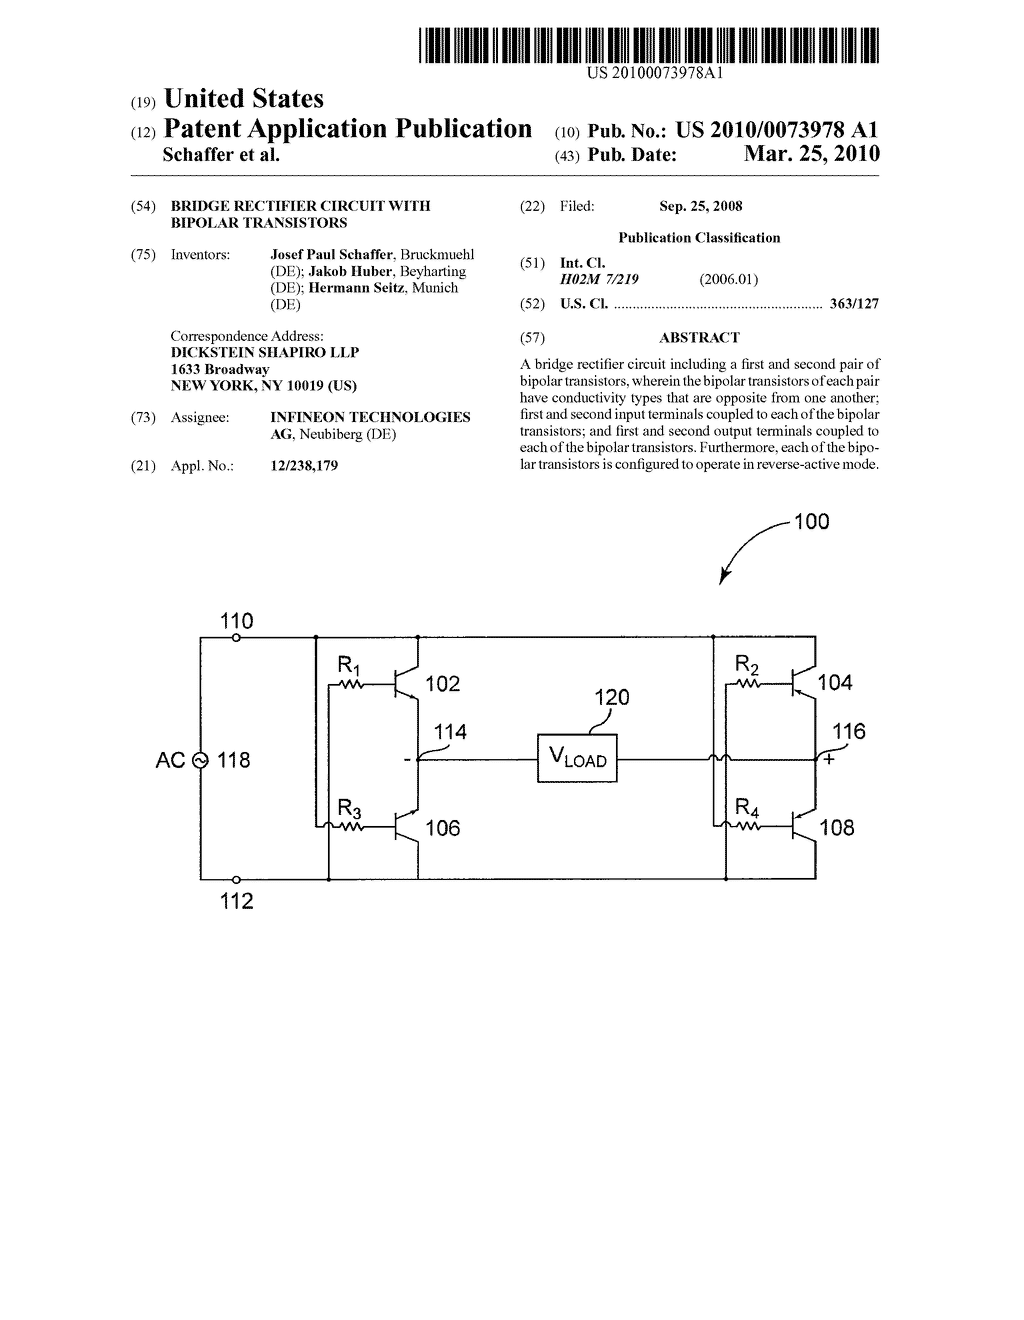 Bridge Rectifier Circuit With Bipolar Transistors Diagram Schematic And Image 01